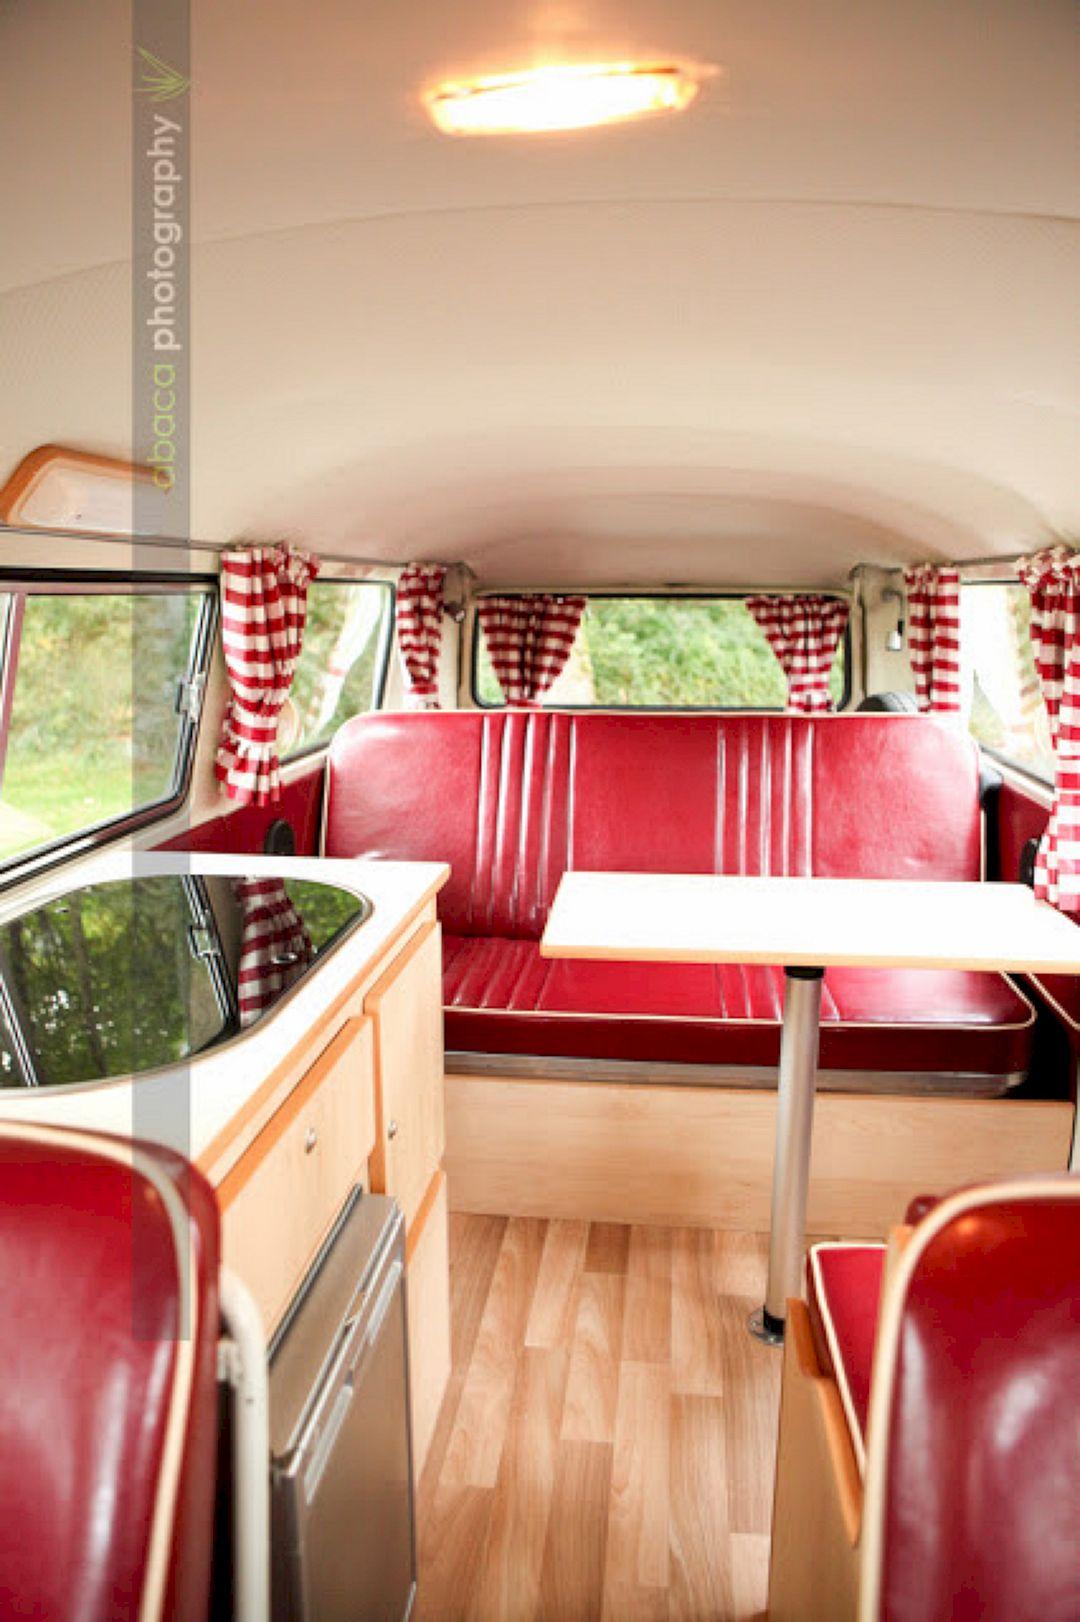 Interior design ideas for camper van no 07 interior for Camper interior designs